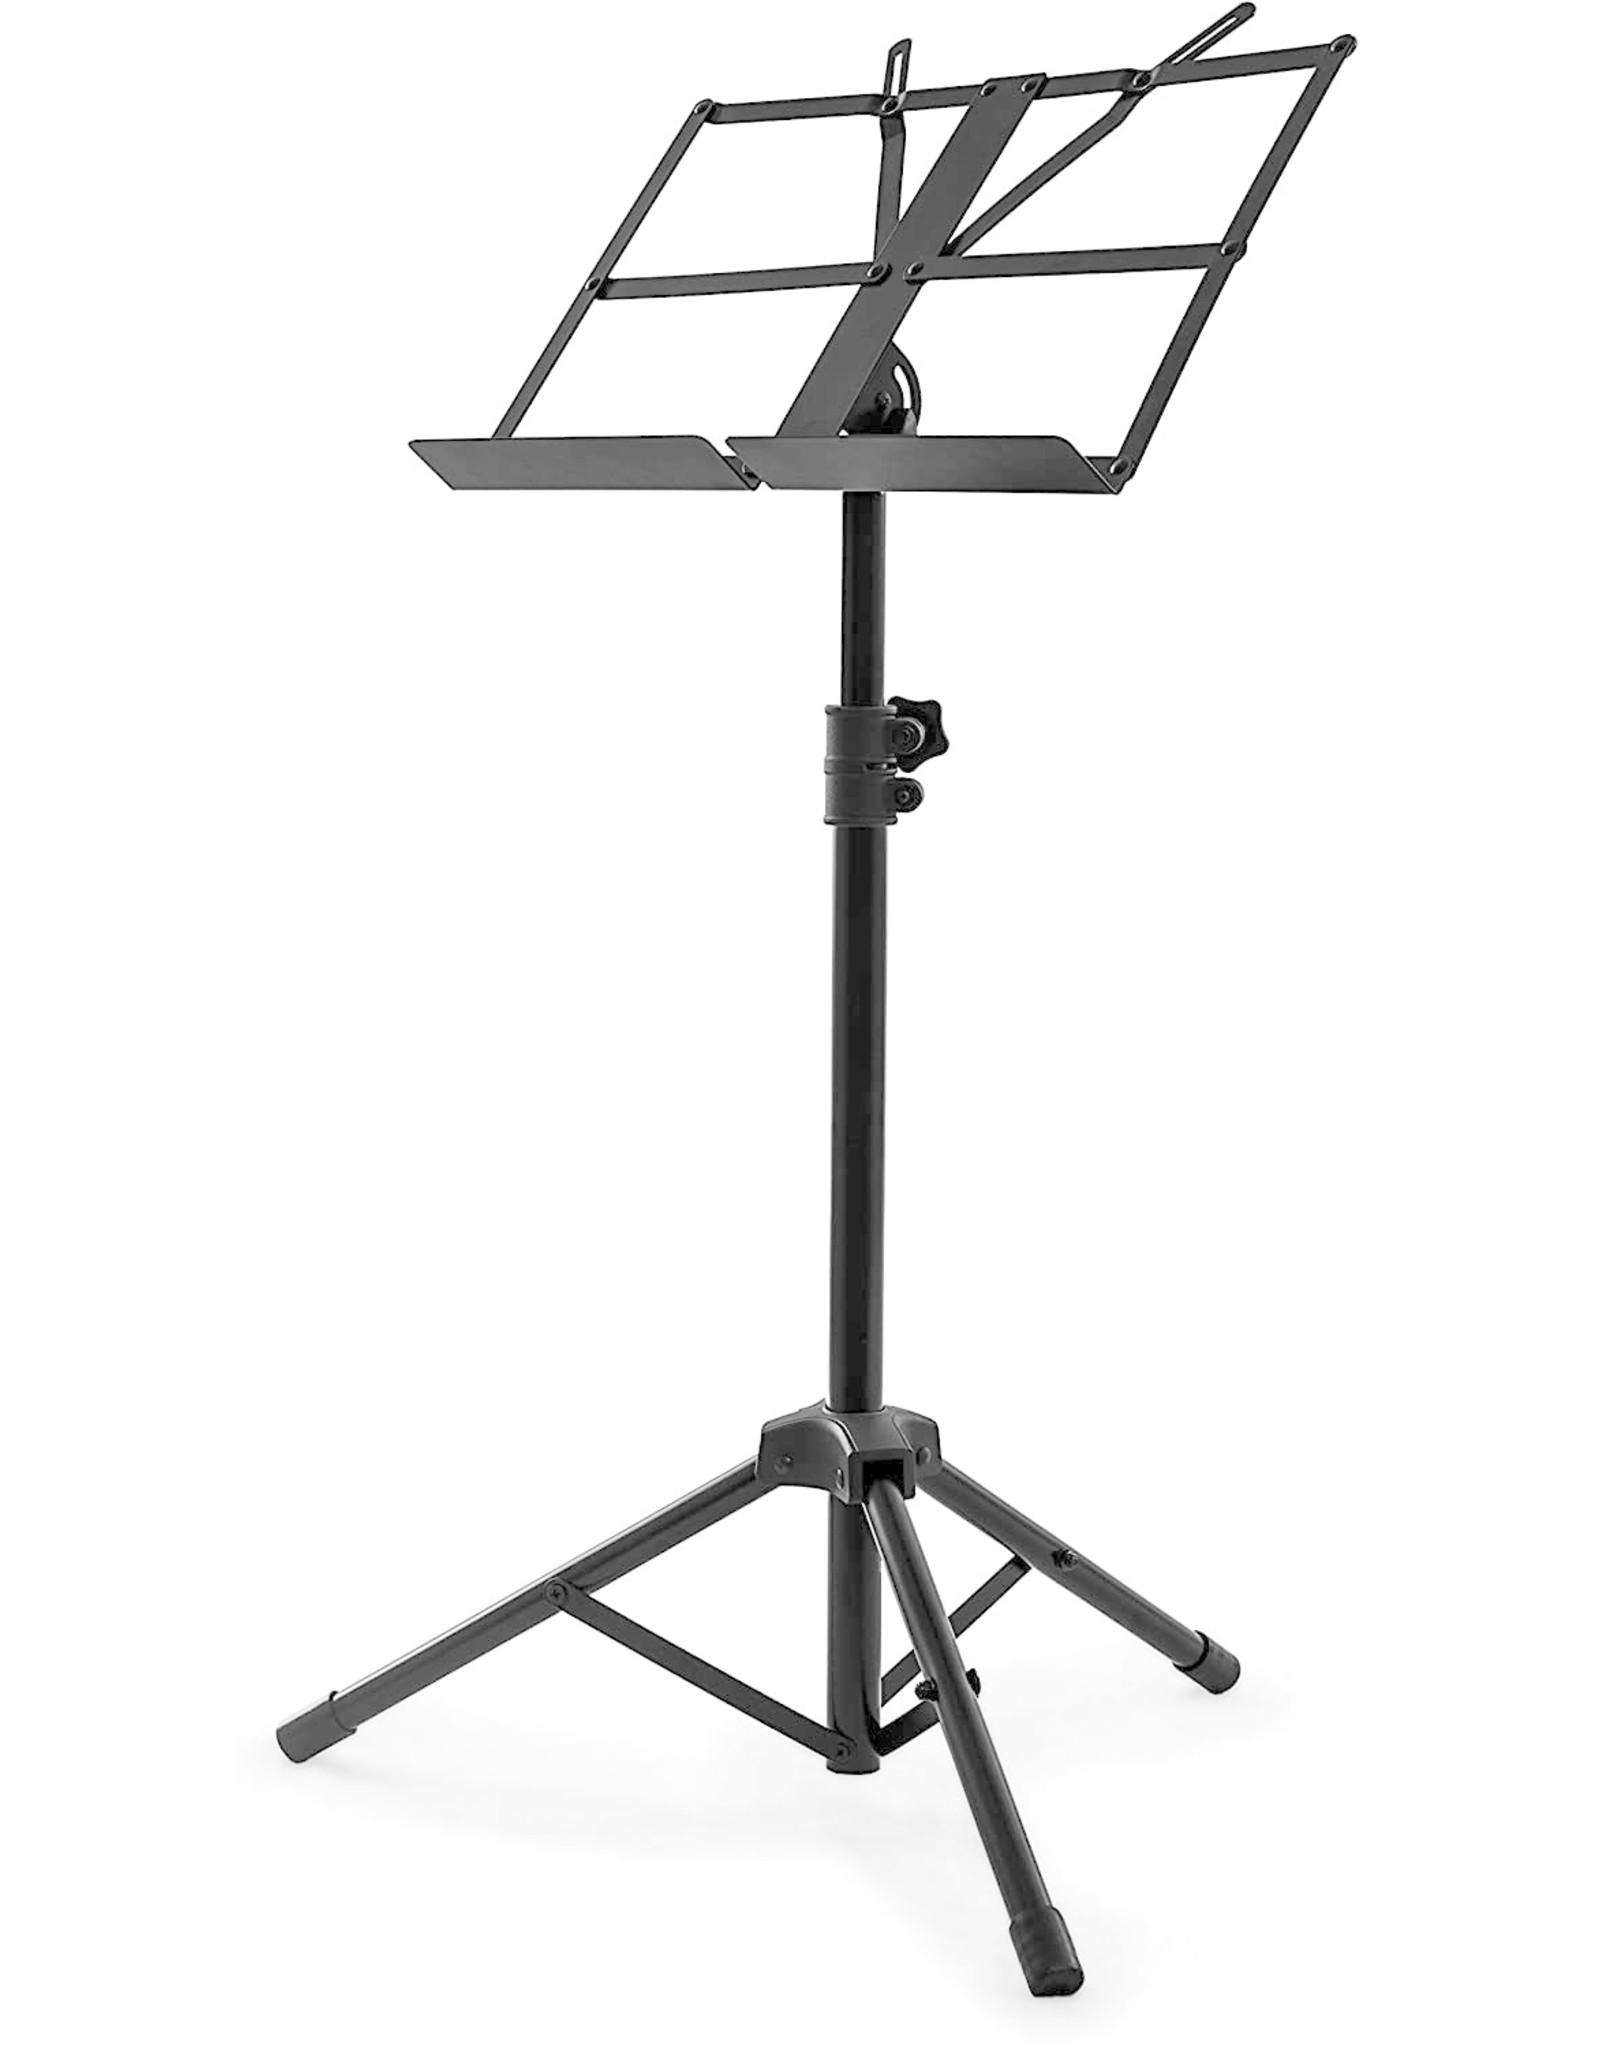 Nomad Nomad Open Folding Desk Music Stand